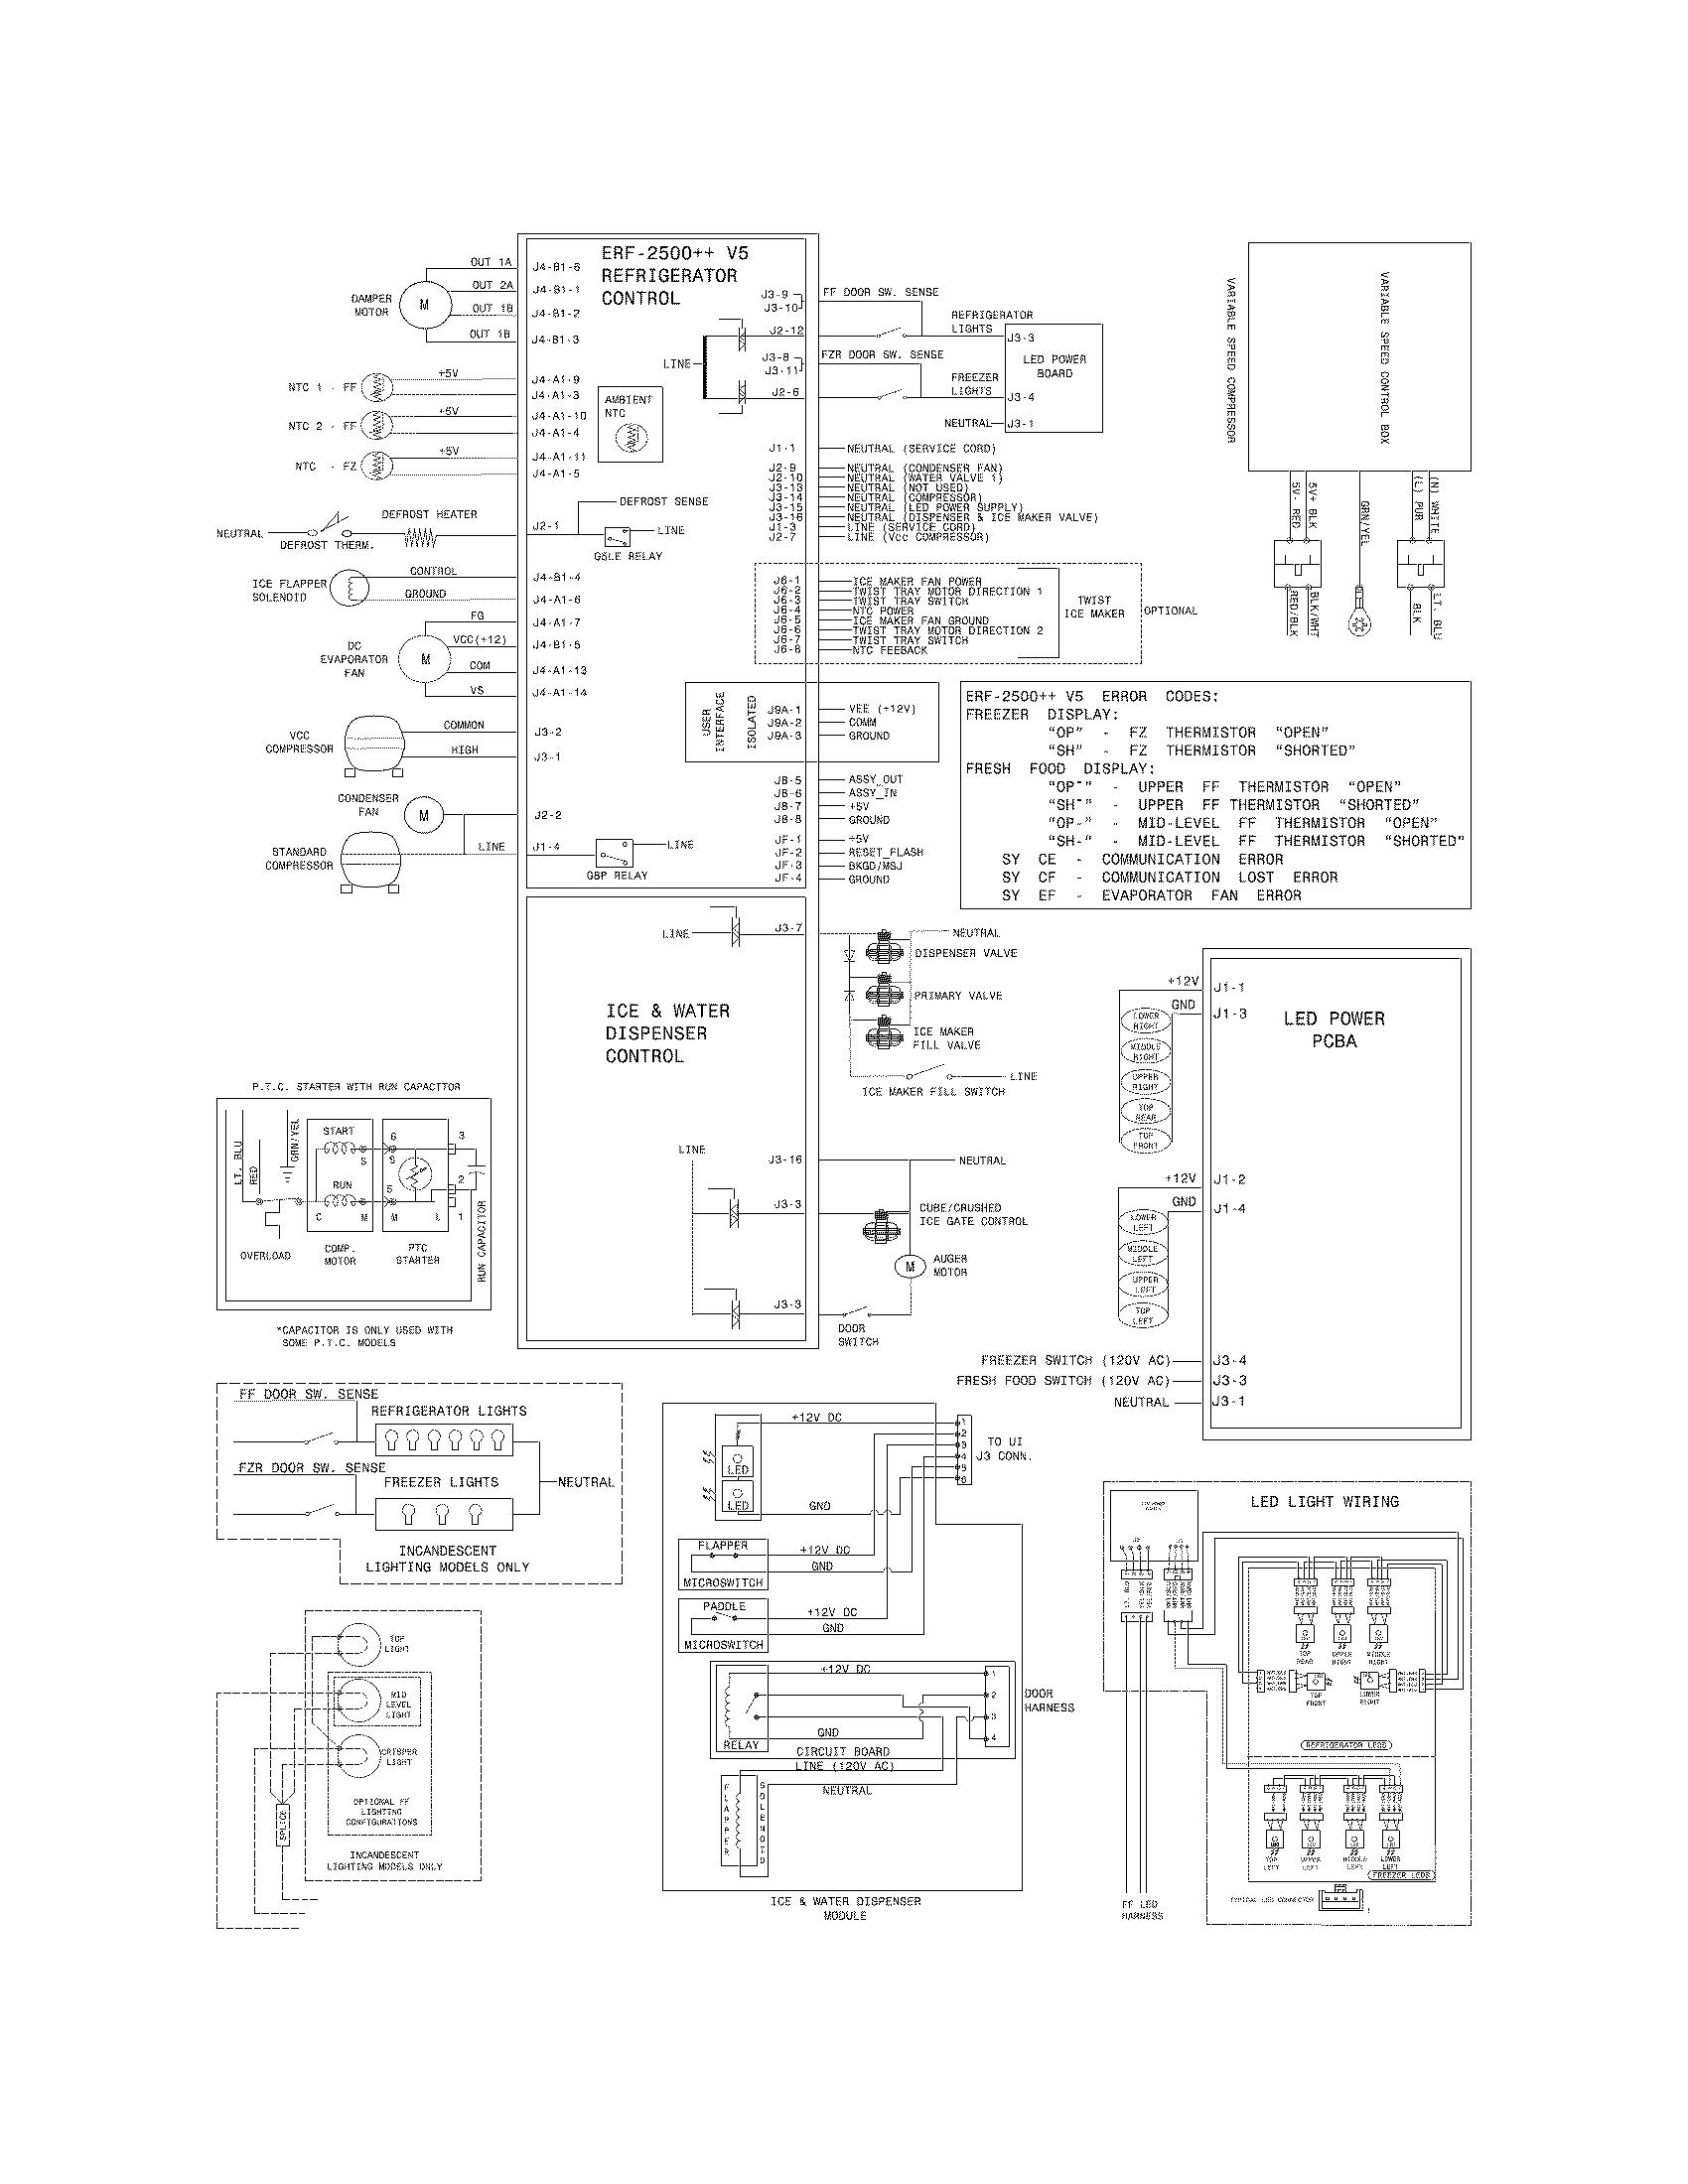 frost refrigerator wiring diagram